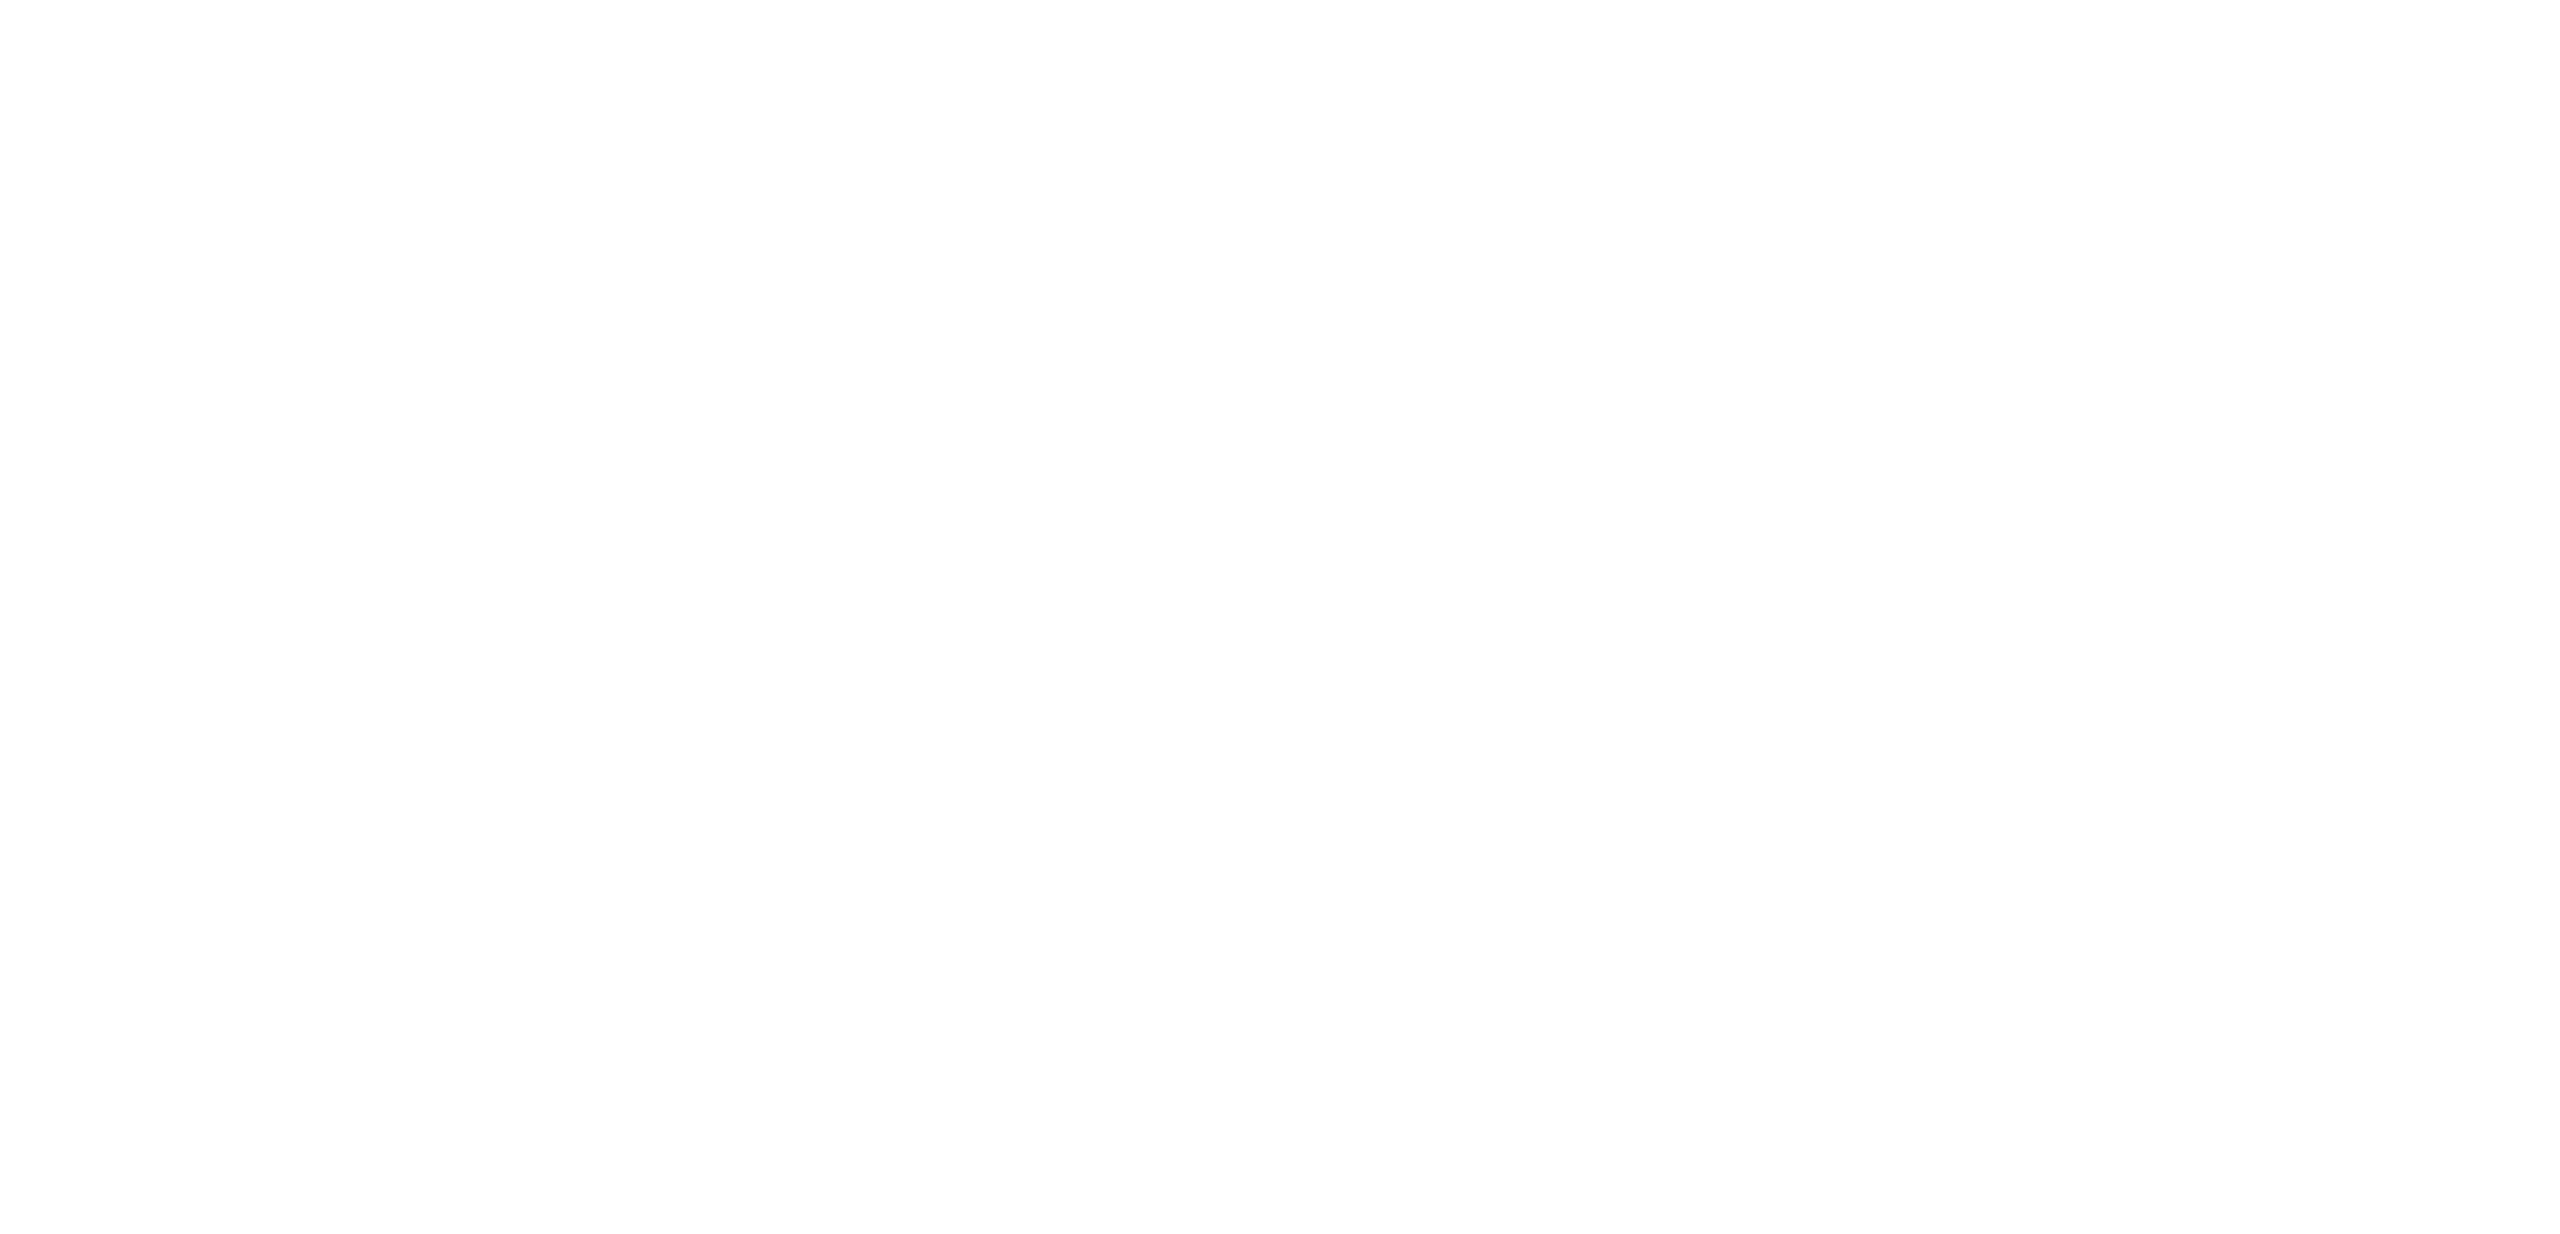 Logos-weiss-waser-financial-solutions-2